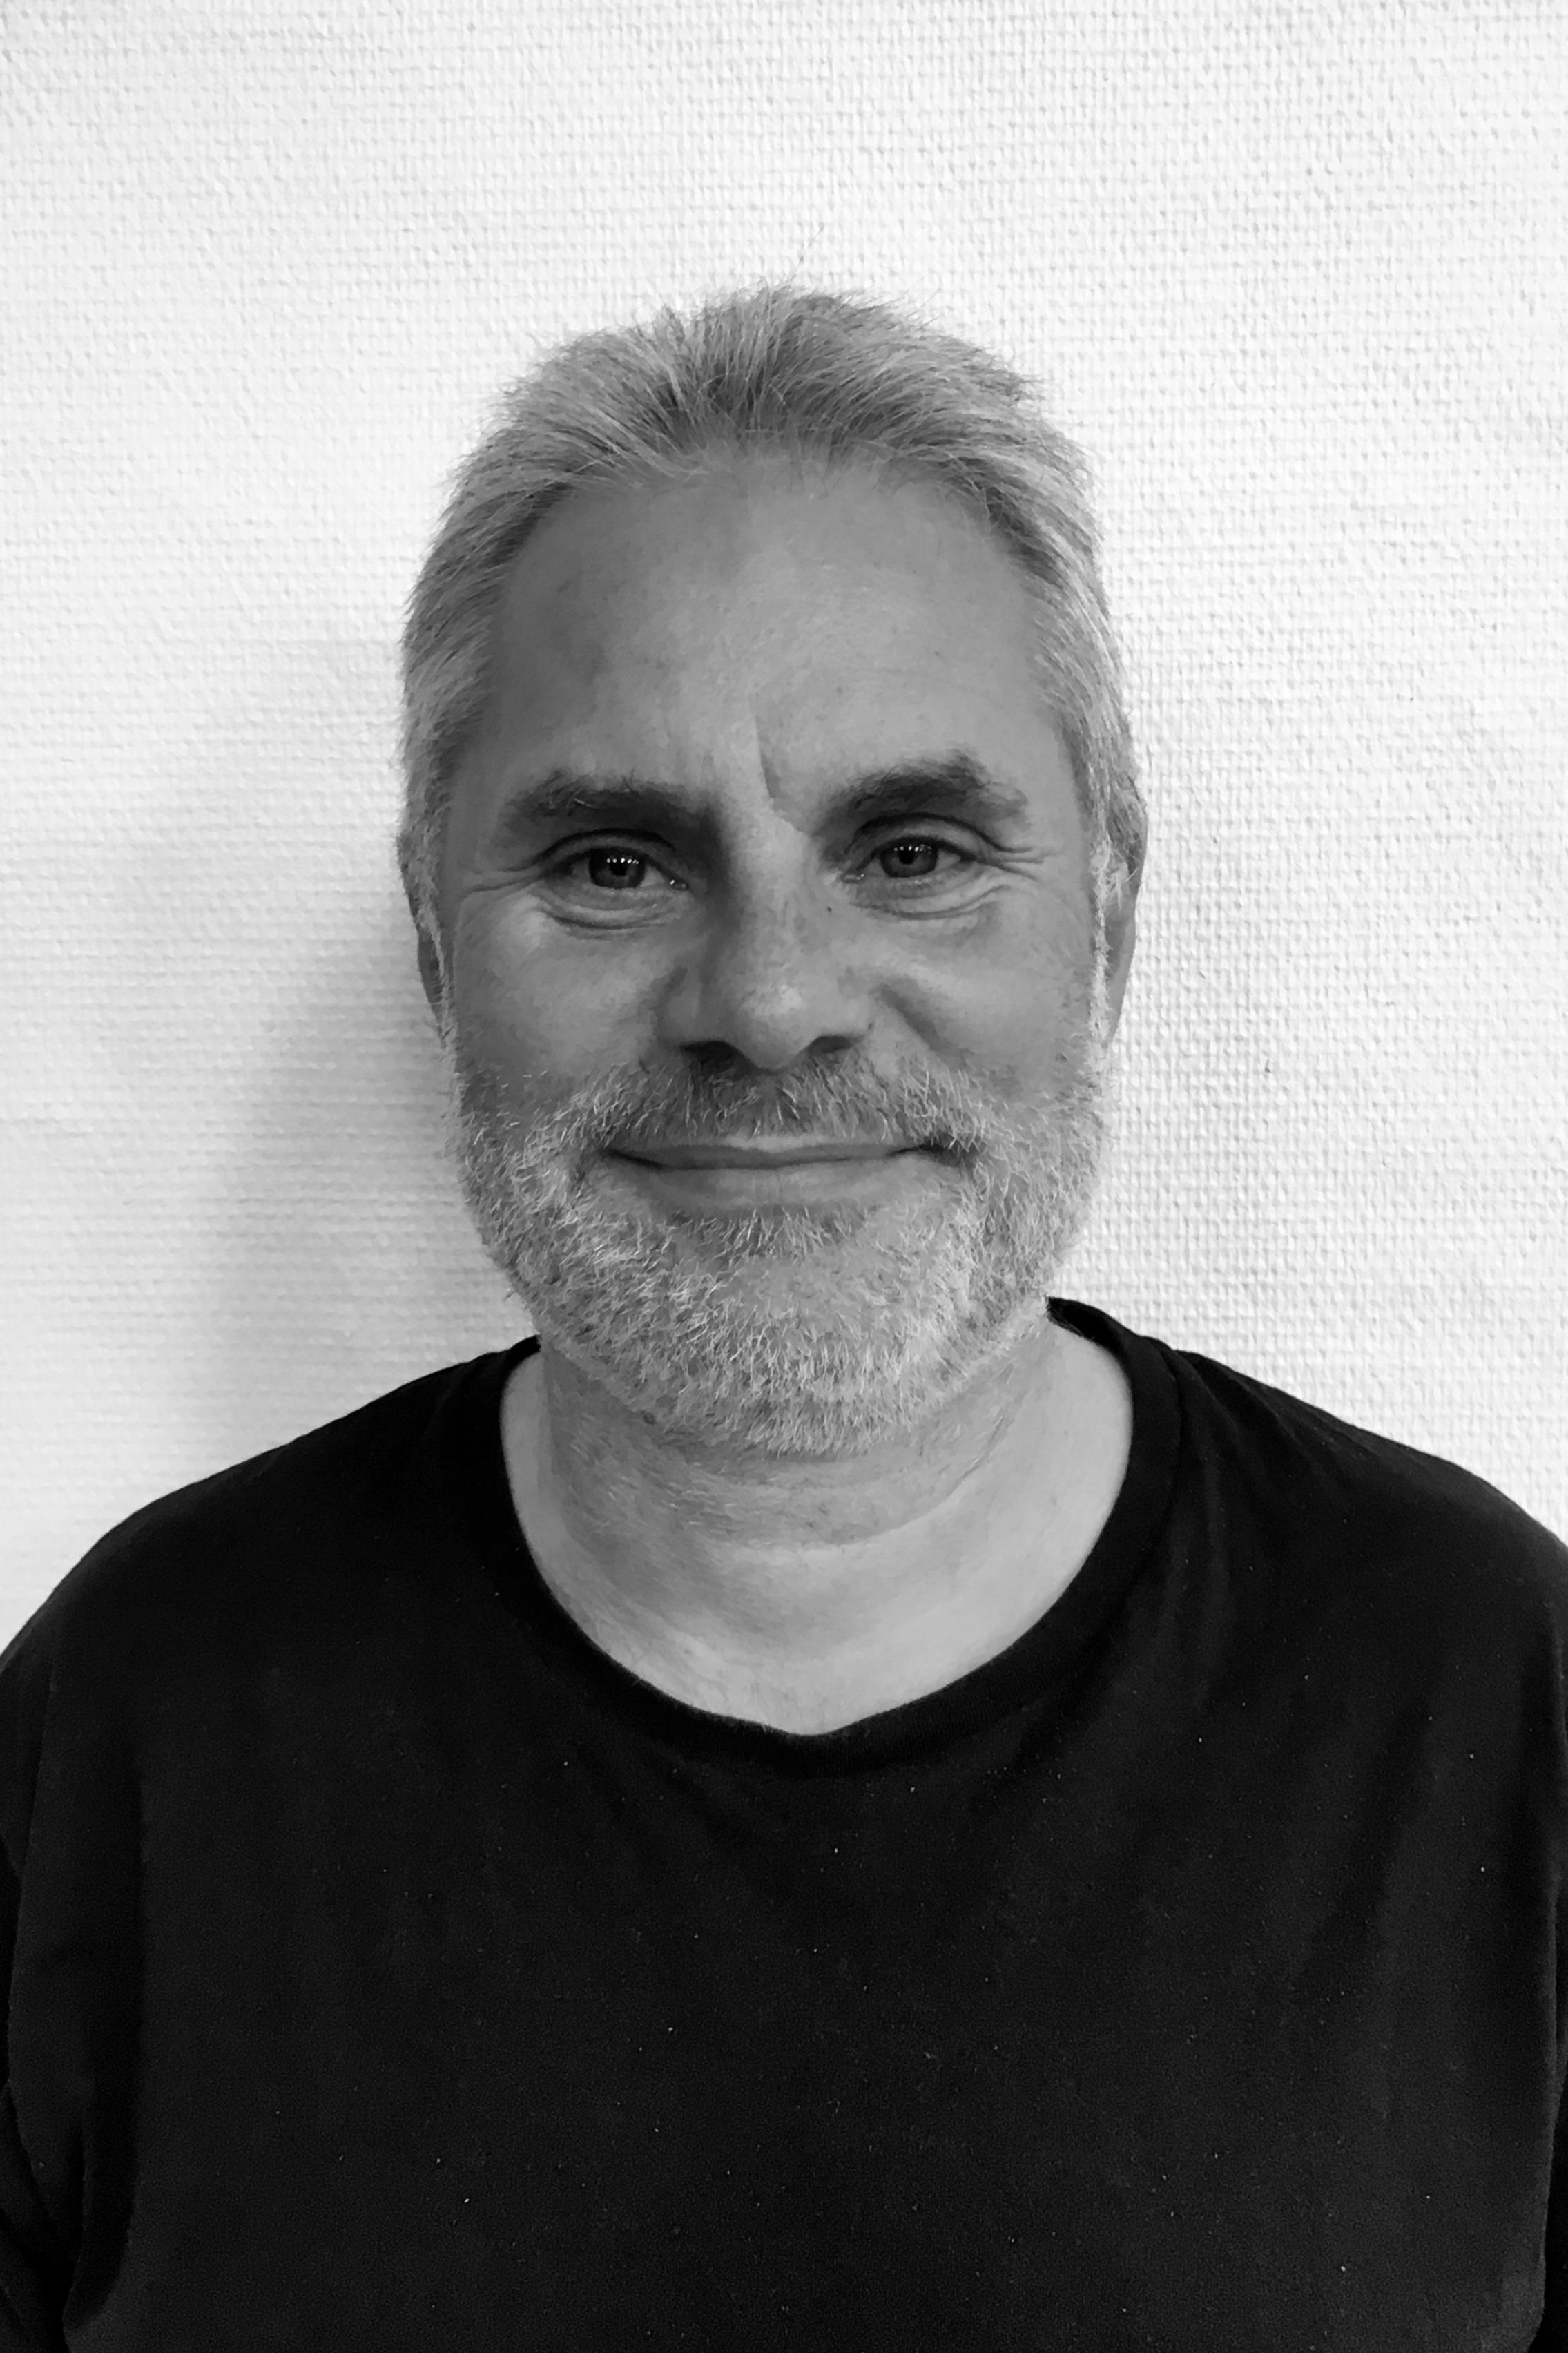 Søren bruun - KLAVER   SAXOFON   KLARINET   TVÆRFLØJTE26 80 44 46SEND EN MAIL▶︎ SE PROFIL